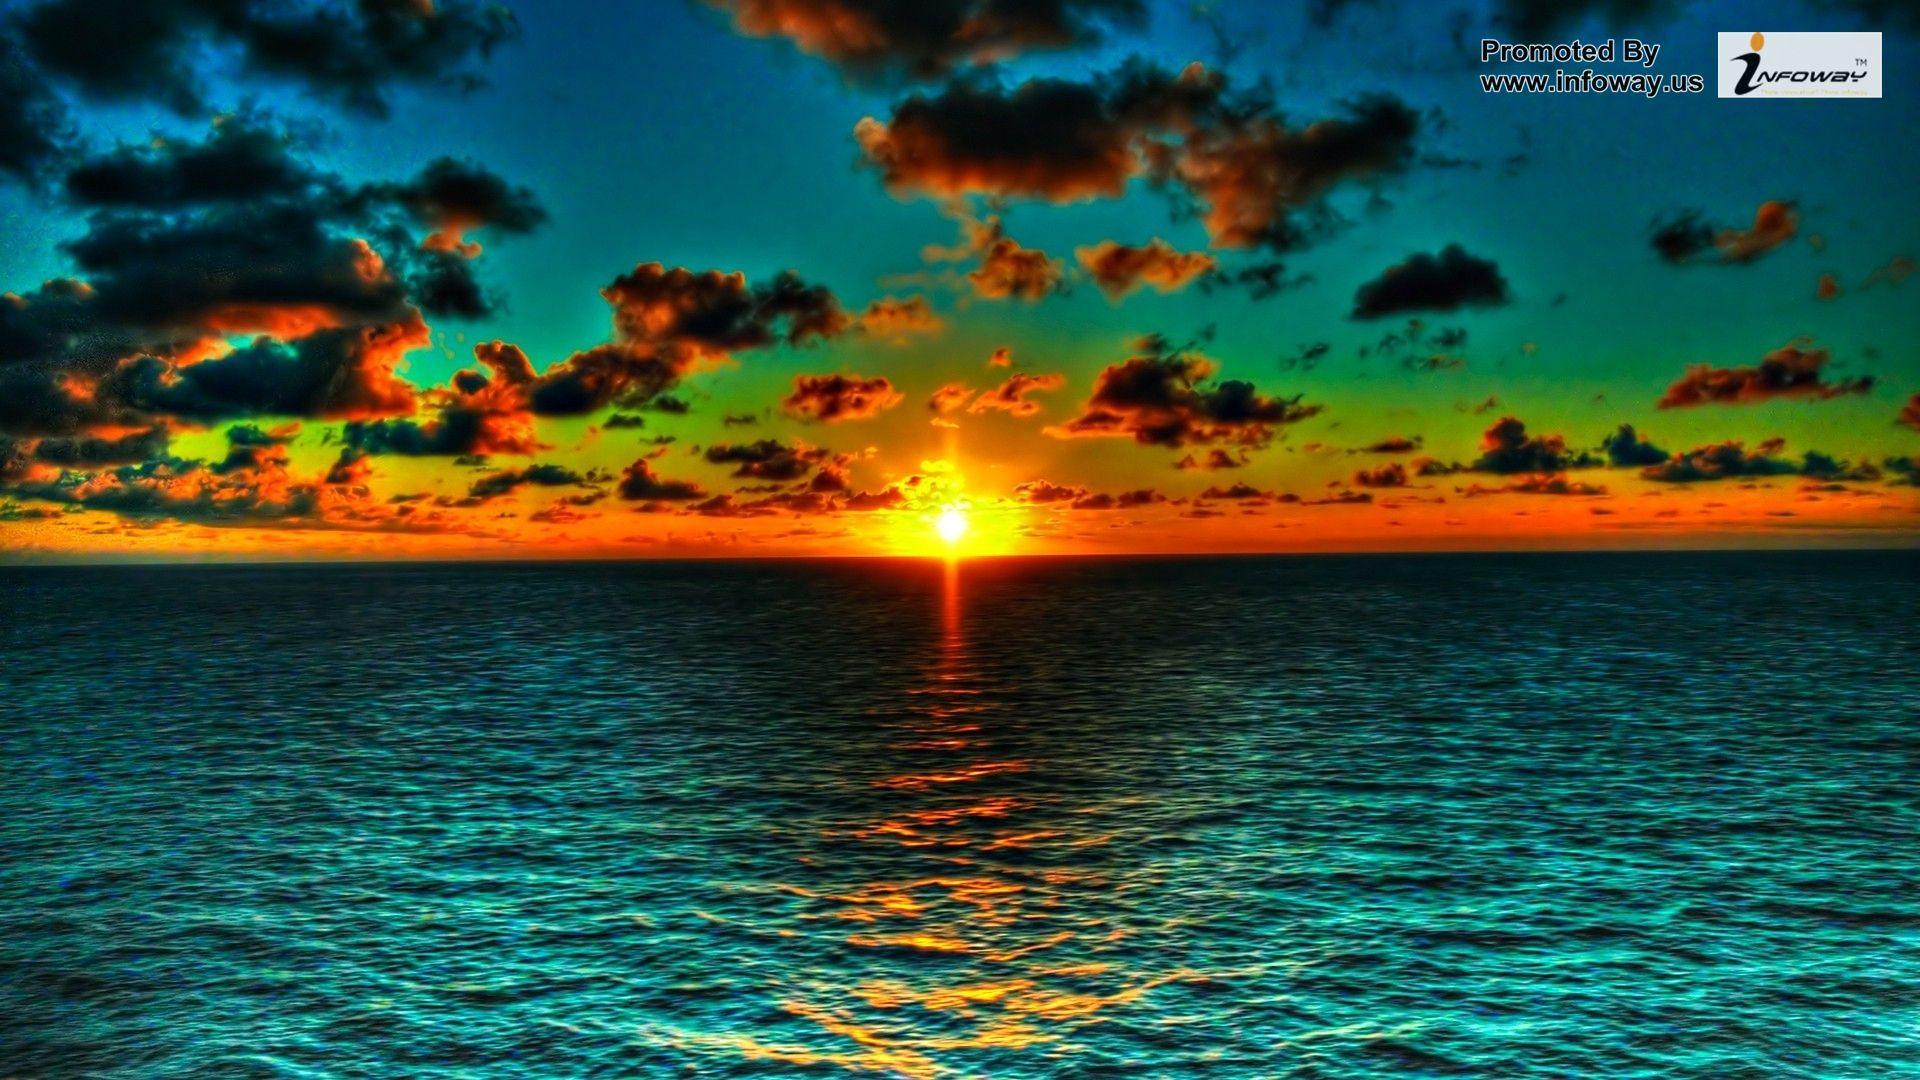 wallpaper waves sunset Beautiful Sunsets And Sunrises Wallpaper 1920x1080